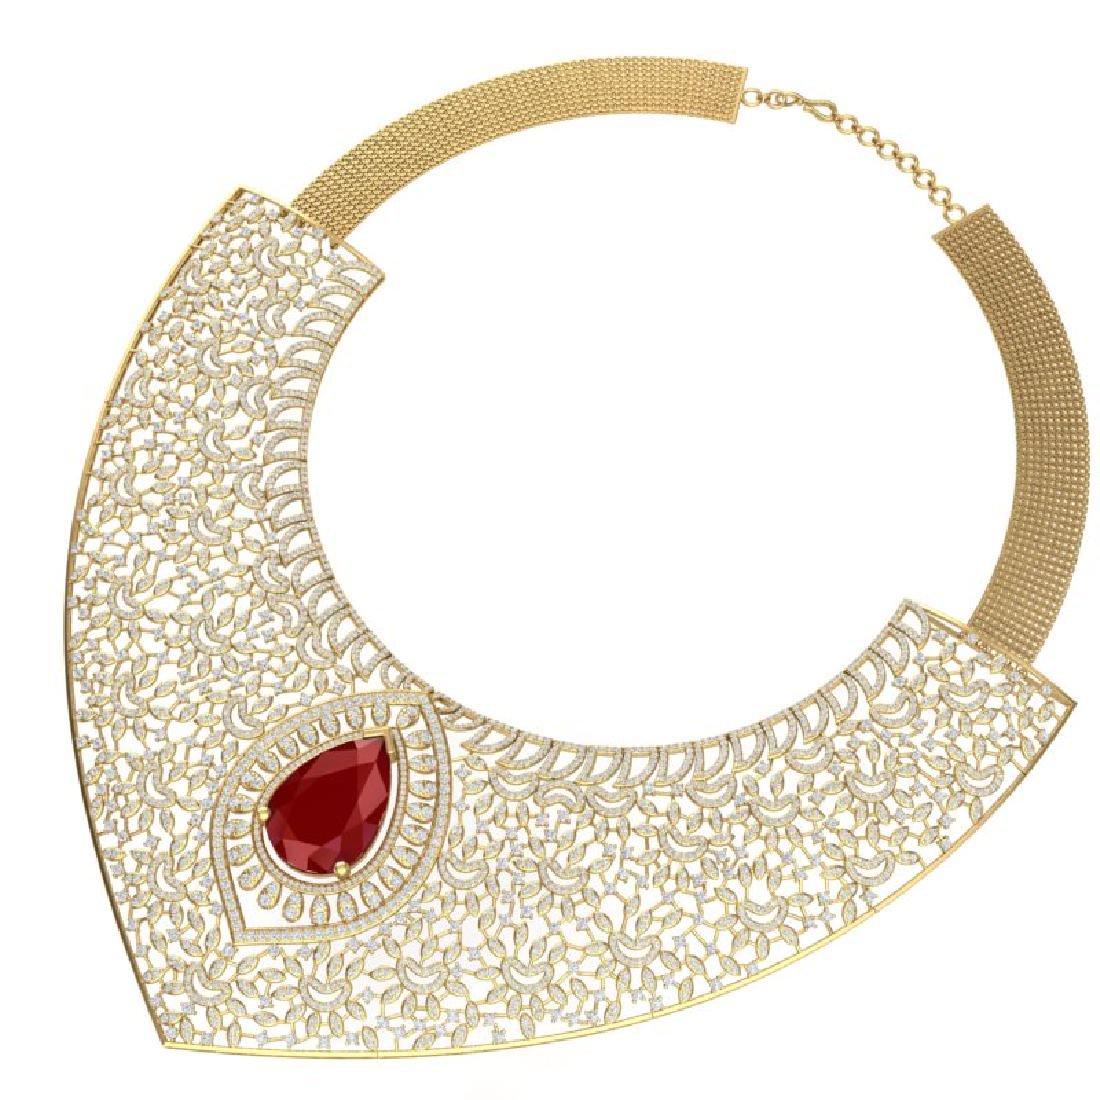 63.93 CTW Royalty Ruby & VS Diamond Necklace 18K Yellow - 3